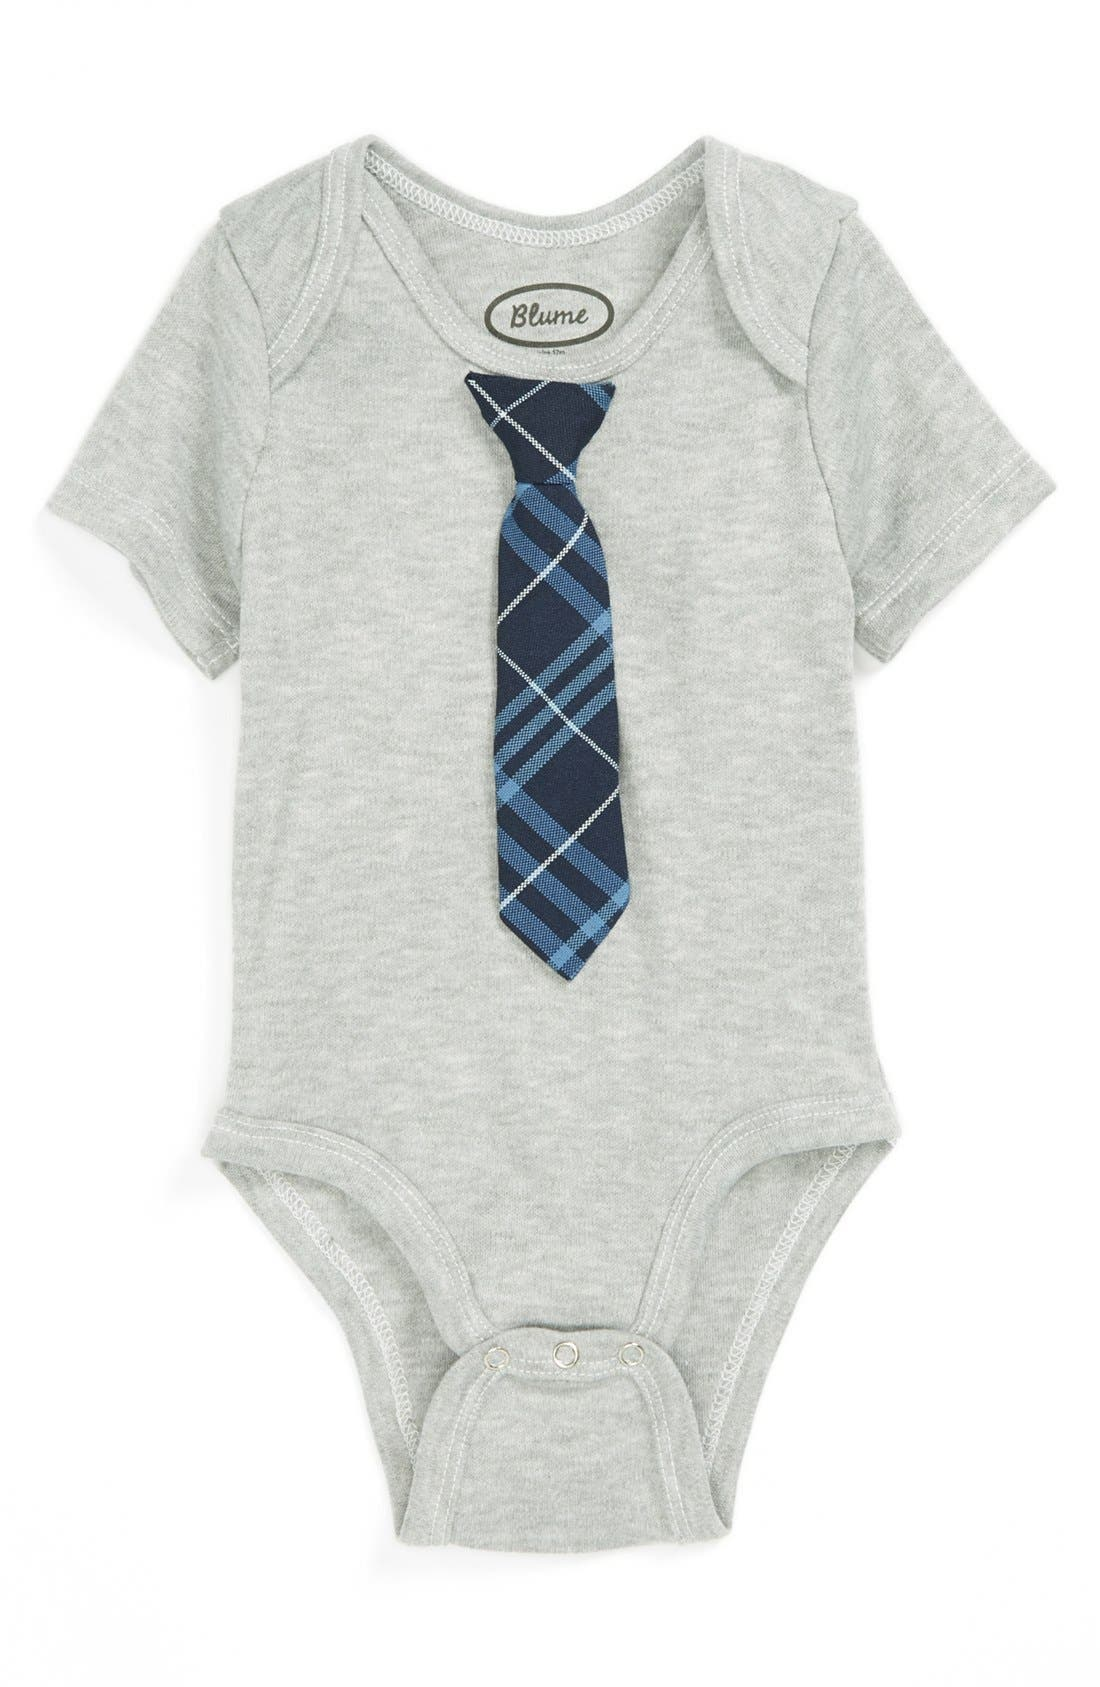 Alternate Image 1 Selected - Blume 'Tie' Bodysuit (Baby Boys)